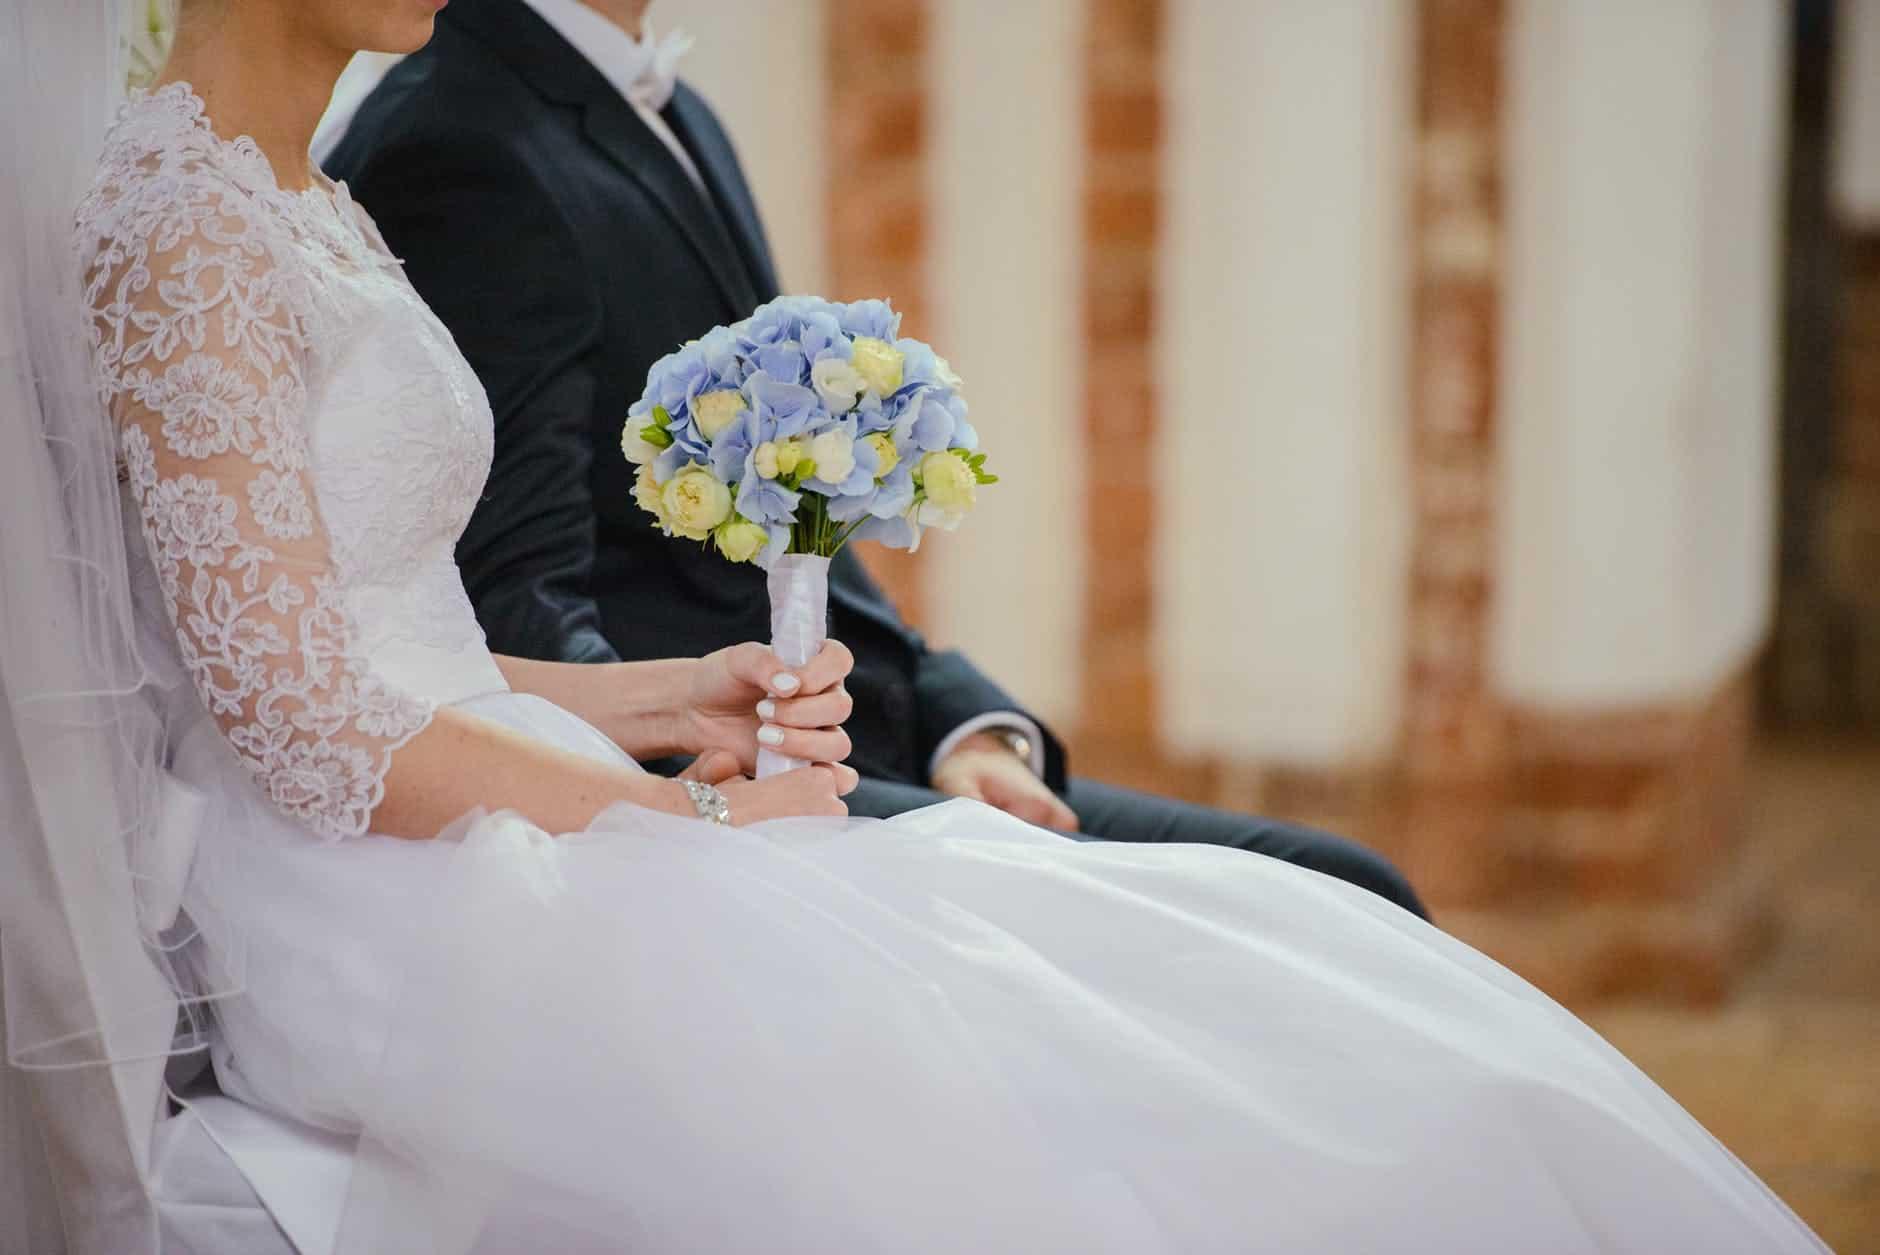 unrecognizable young newlyweds sitting together during wedding celebration